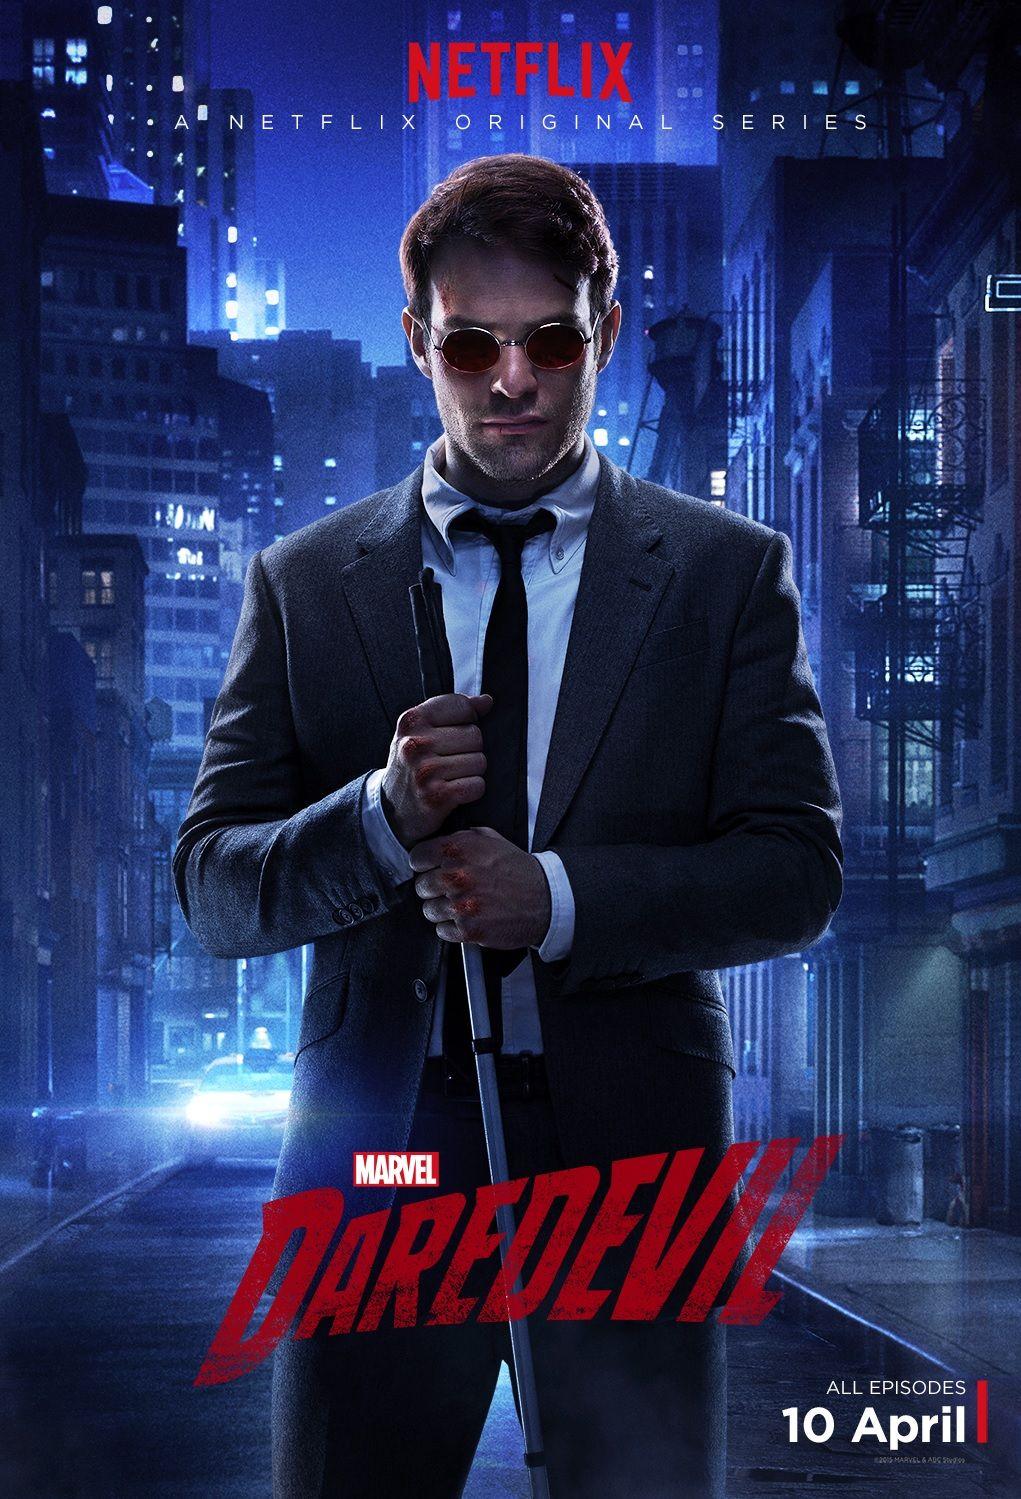 Daredevil-Matt-Murdock-poster-Сорвиголова-фантастический-сериал-комиксы-scifidaily.ru_.jpg